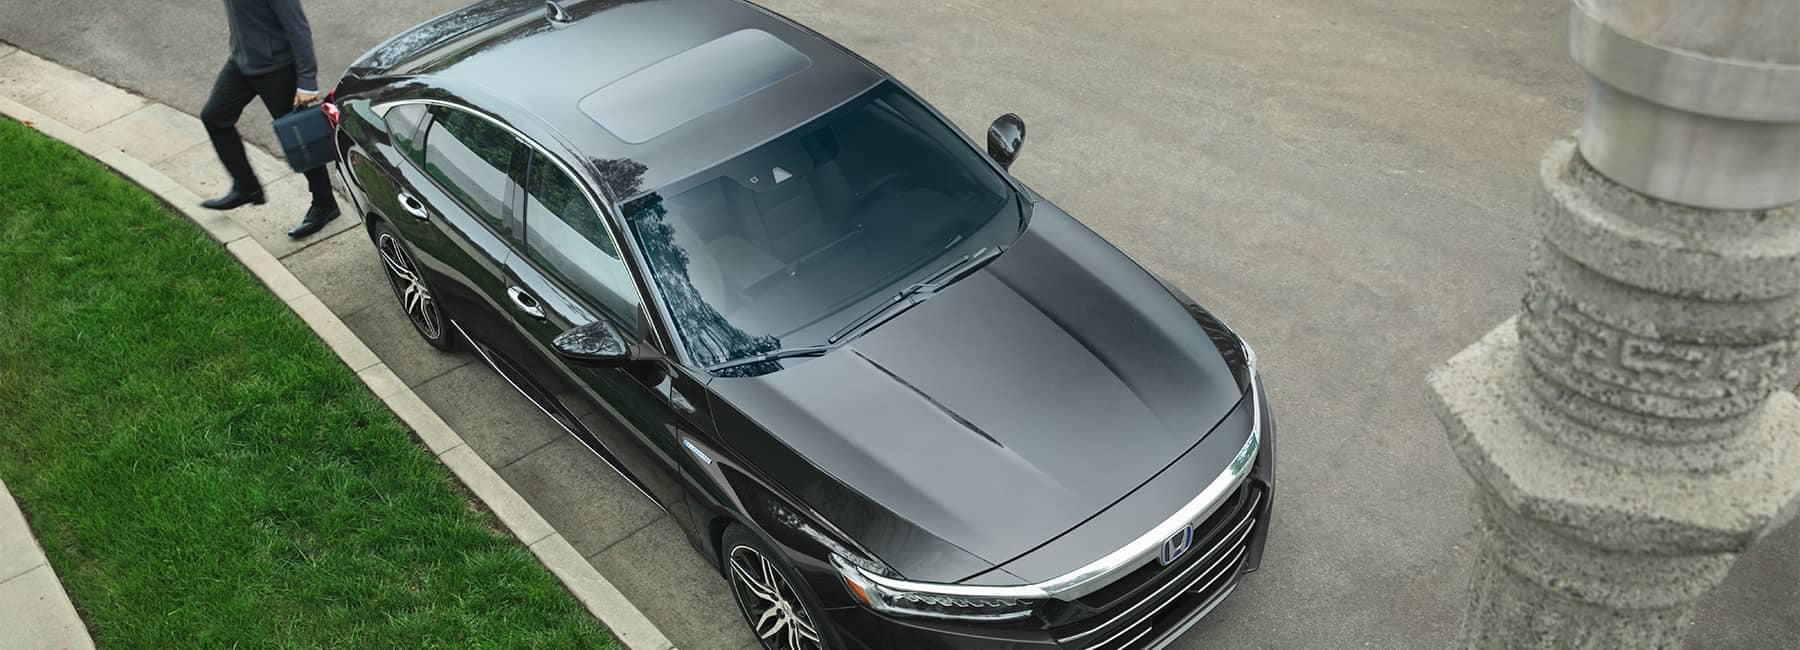 Top View of a 2021 Black Honda Accord